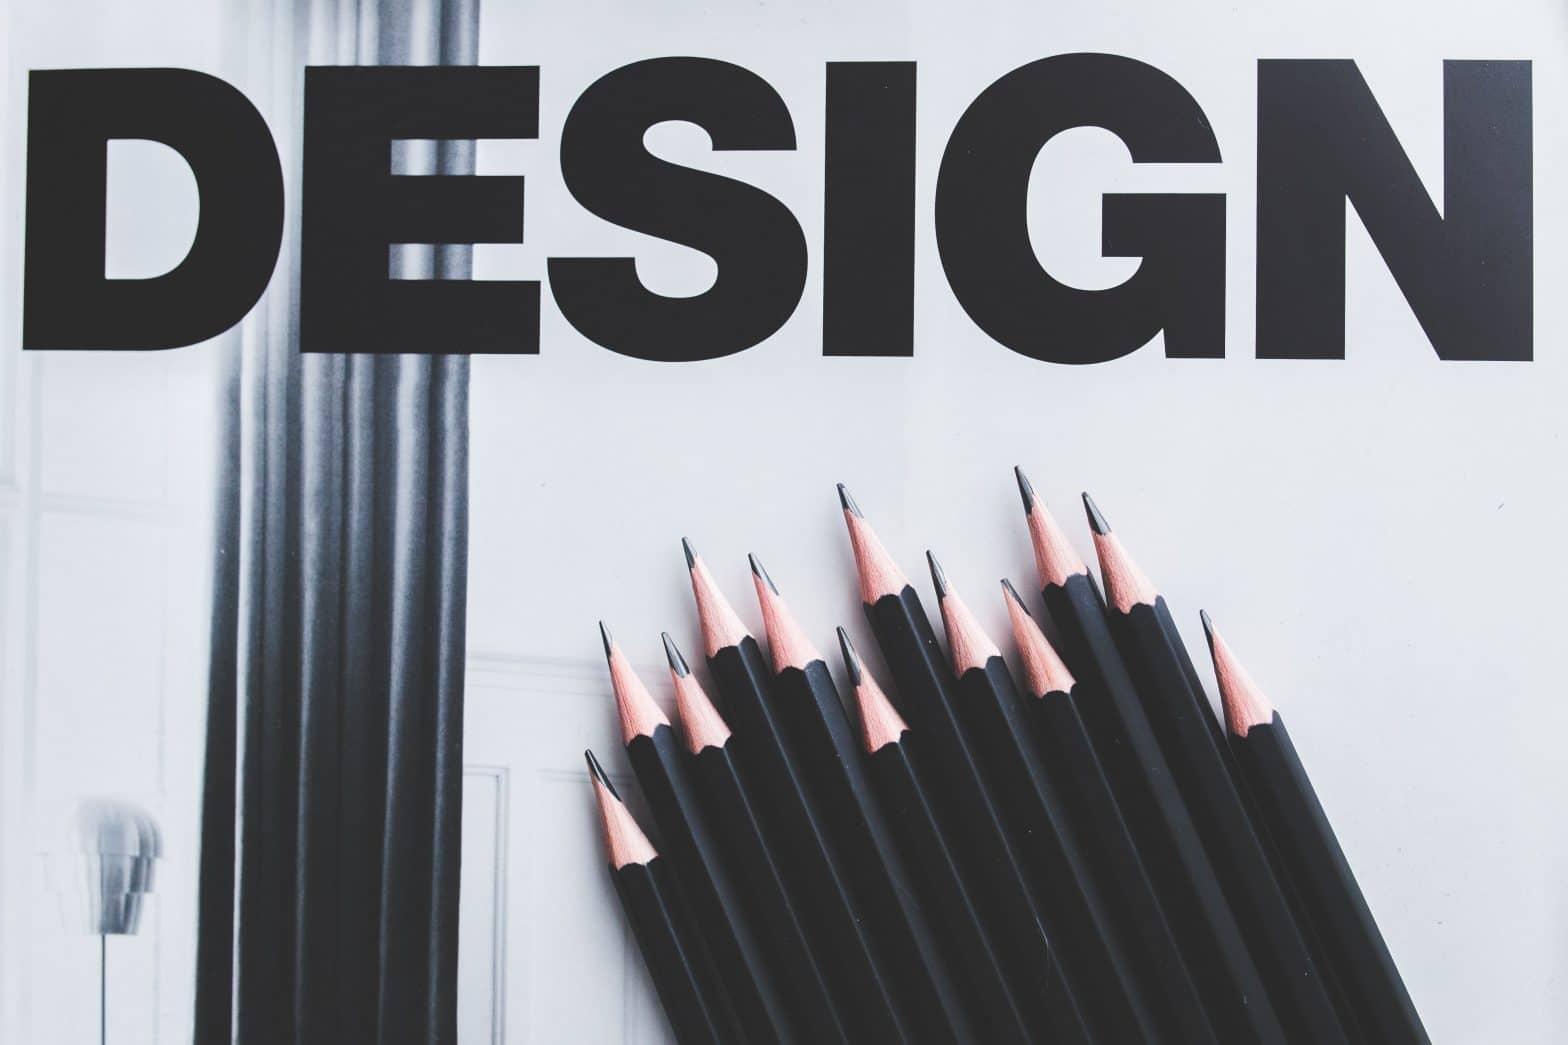 Designs Pencils Drawing